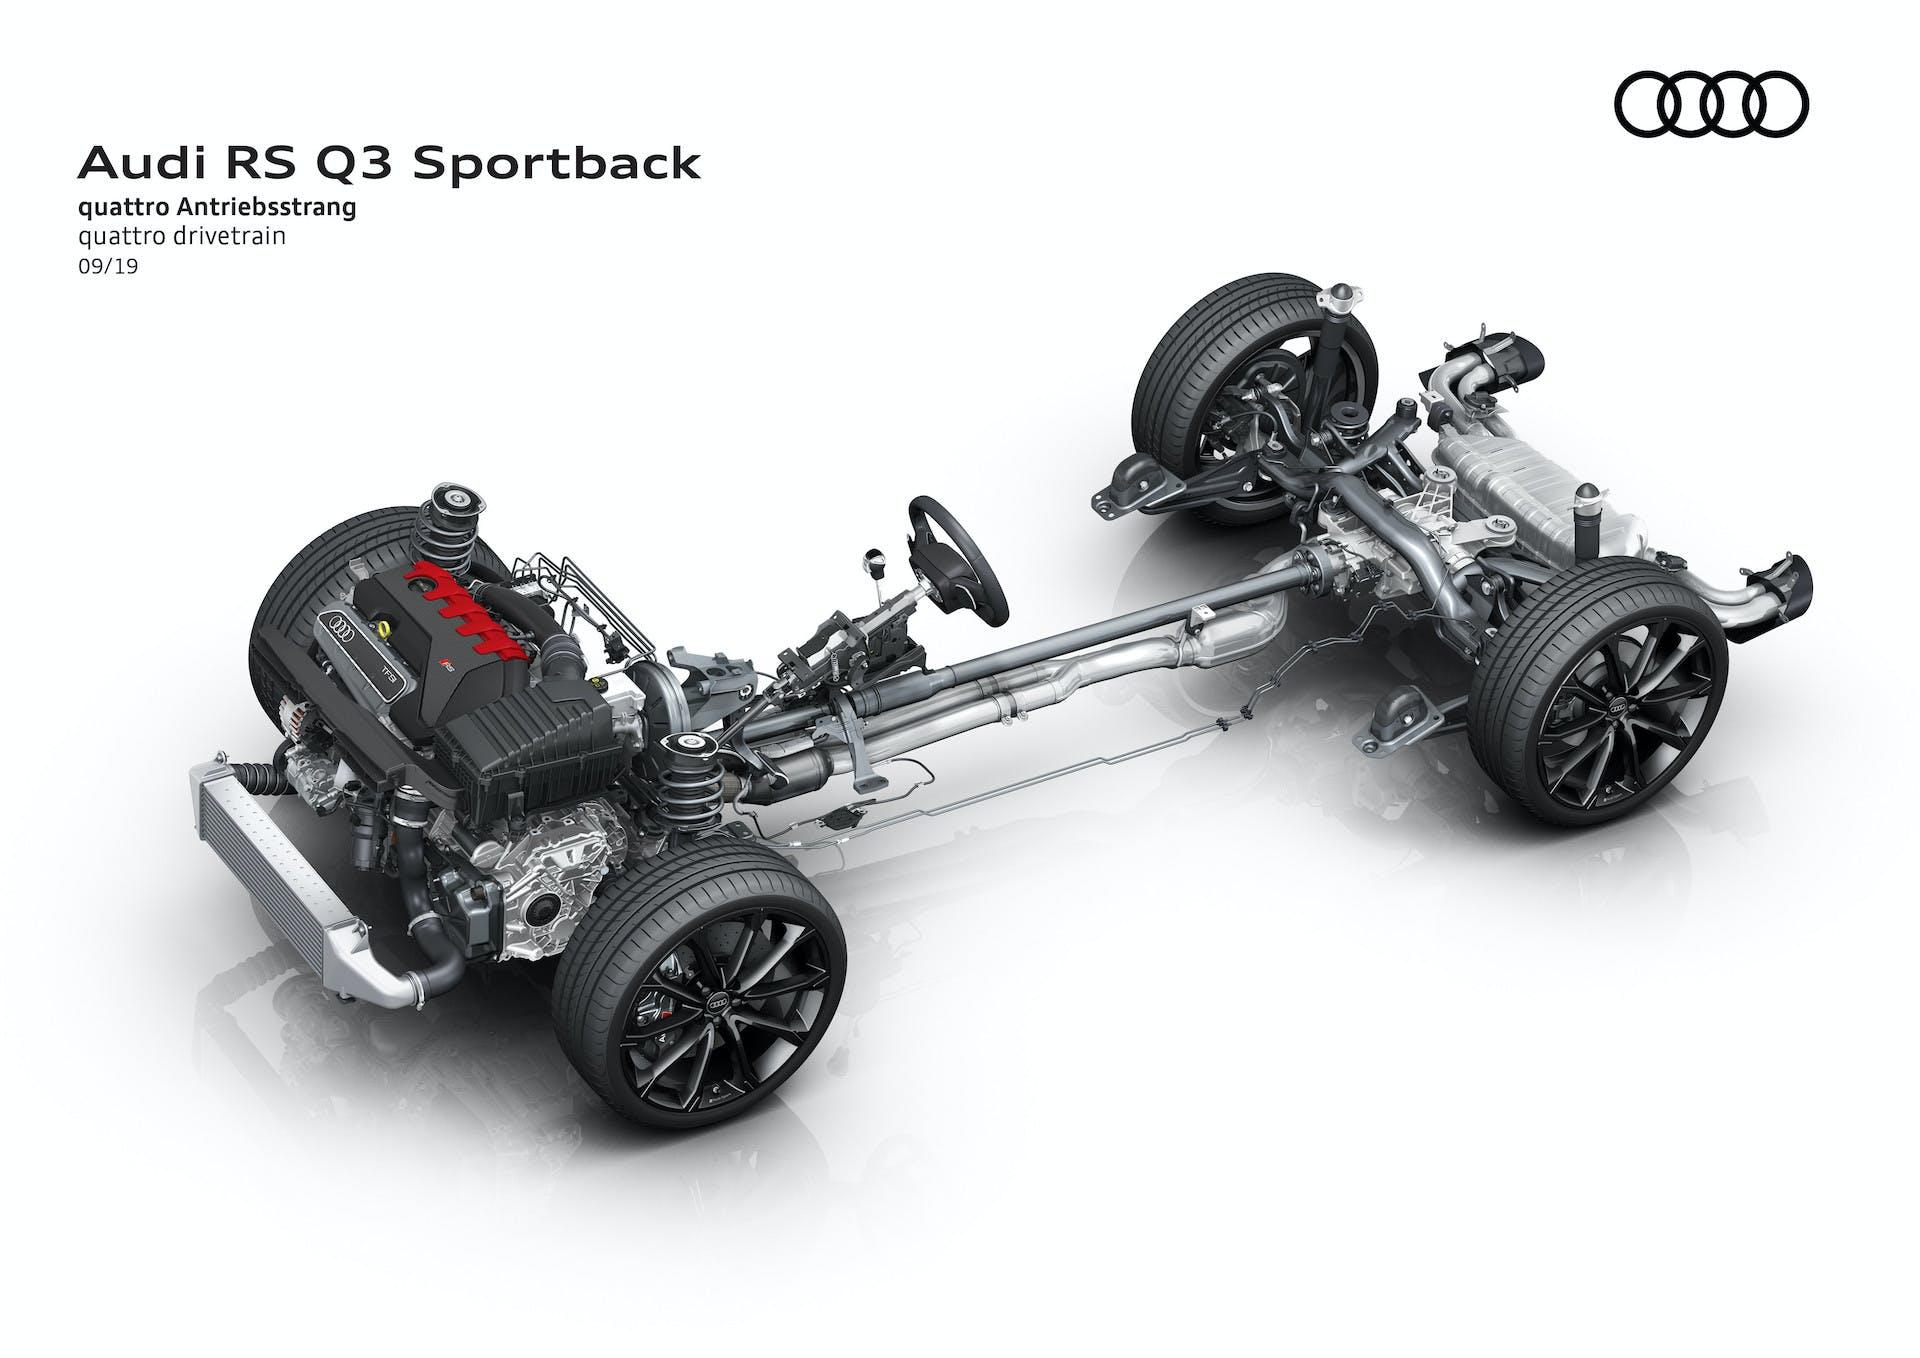 Audi RS Q3 powertrain